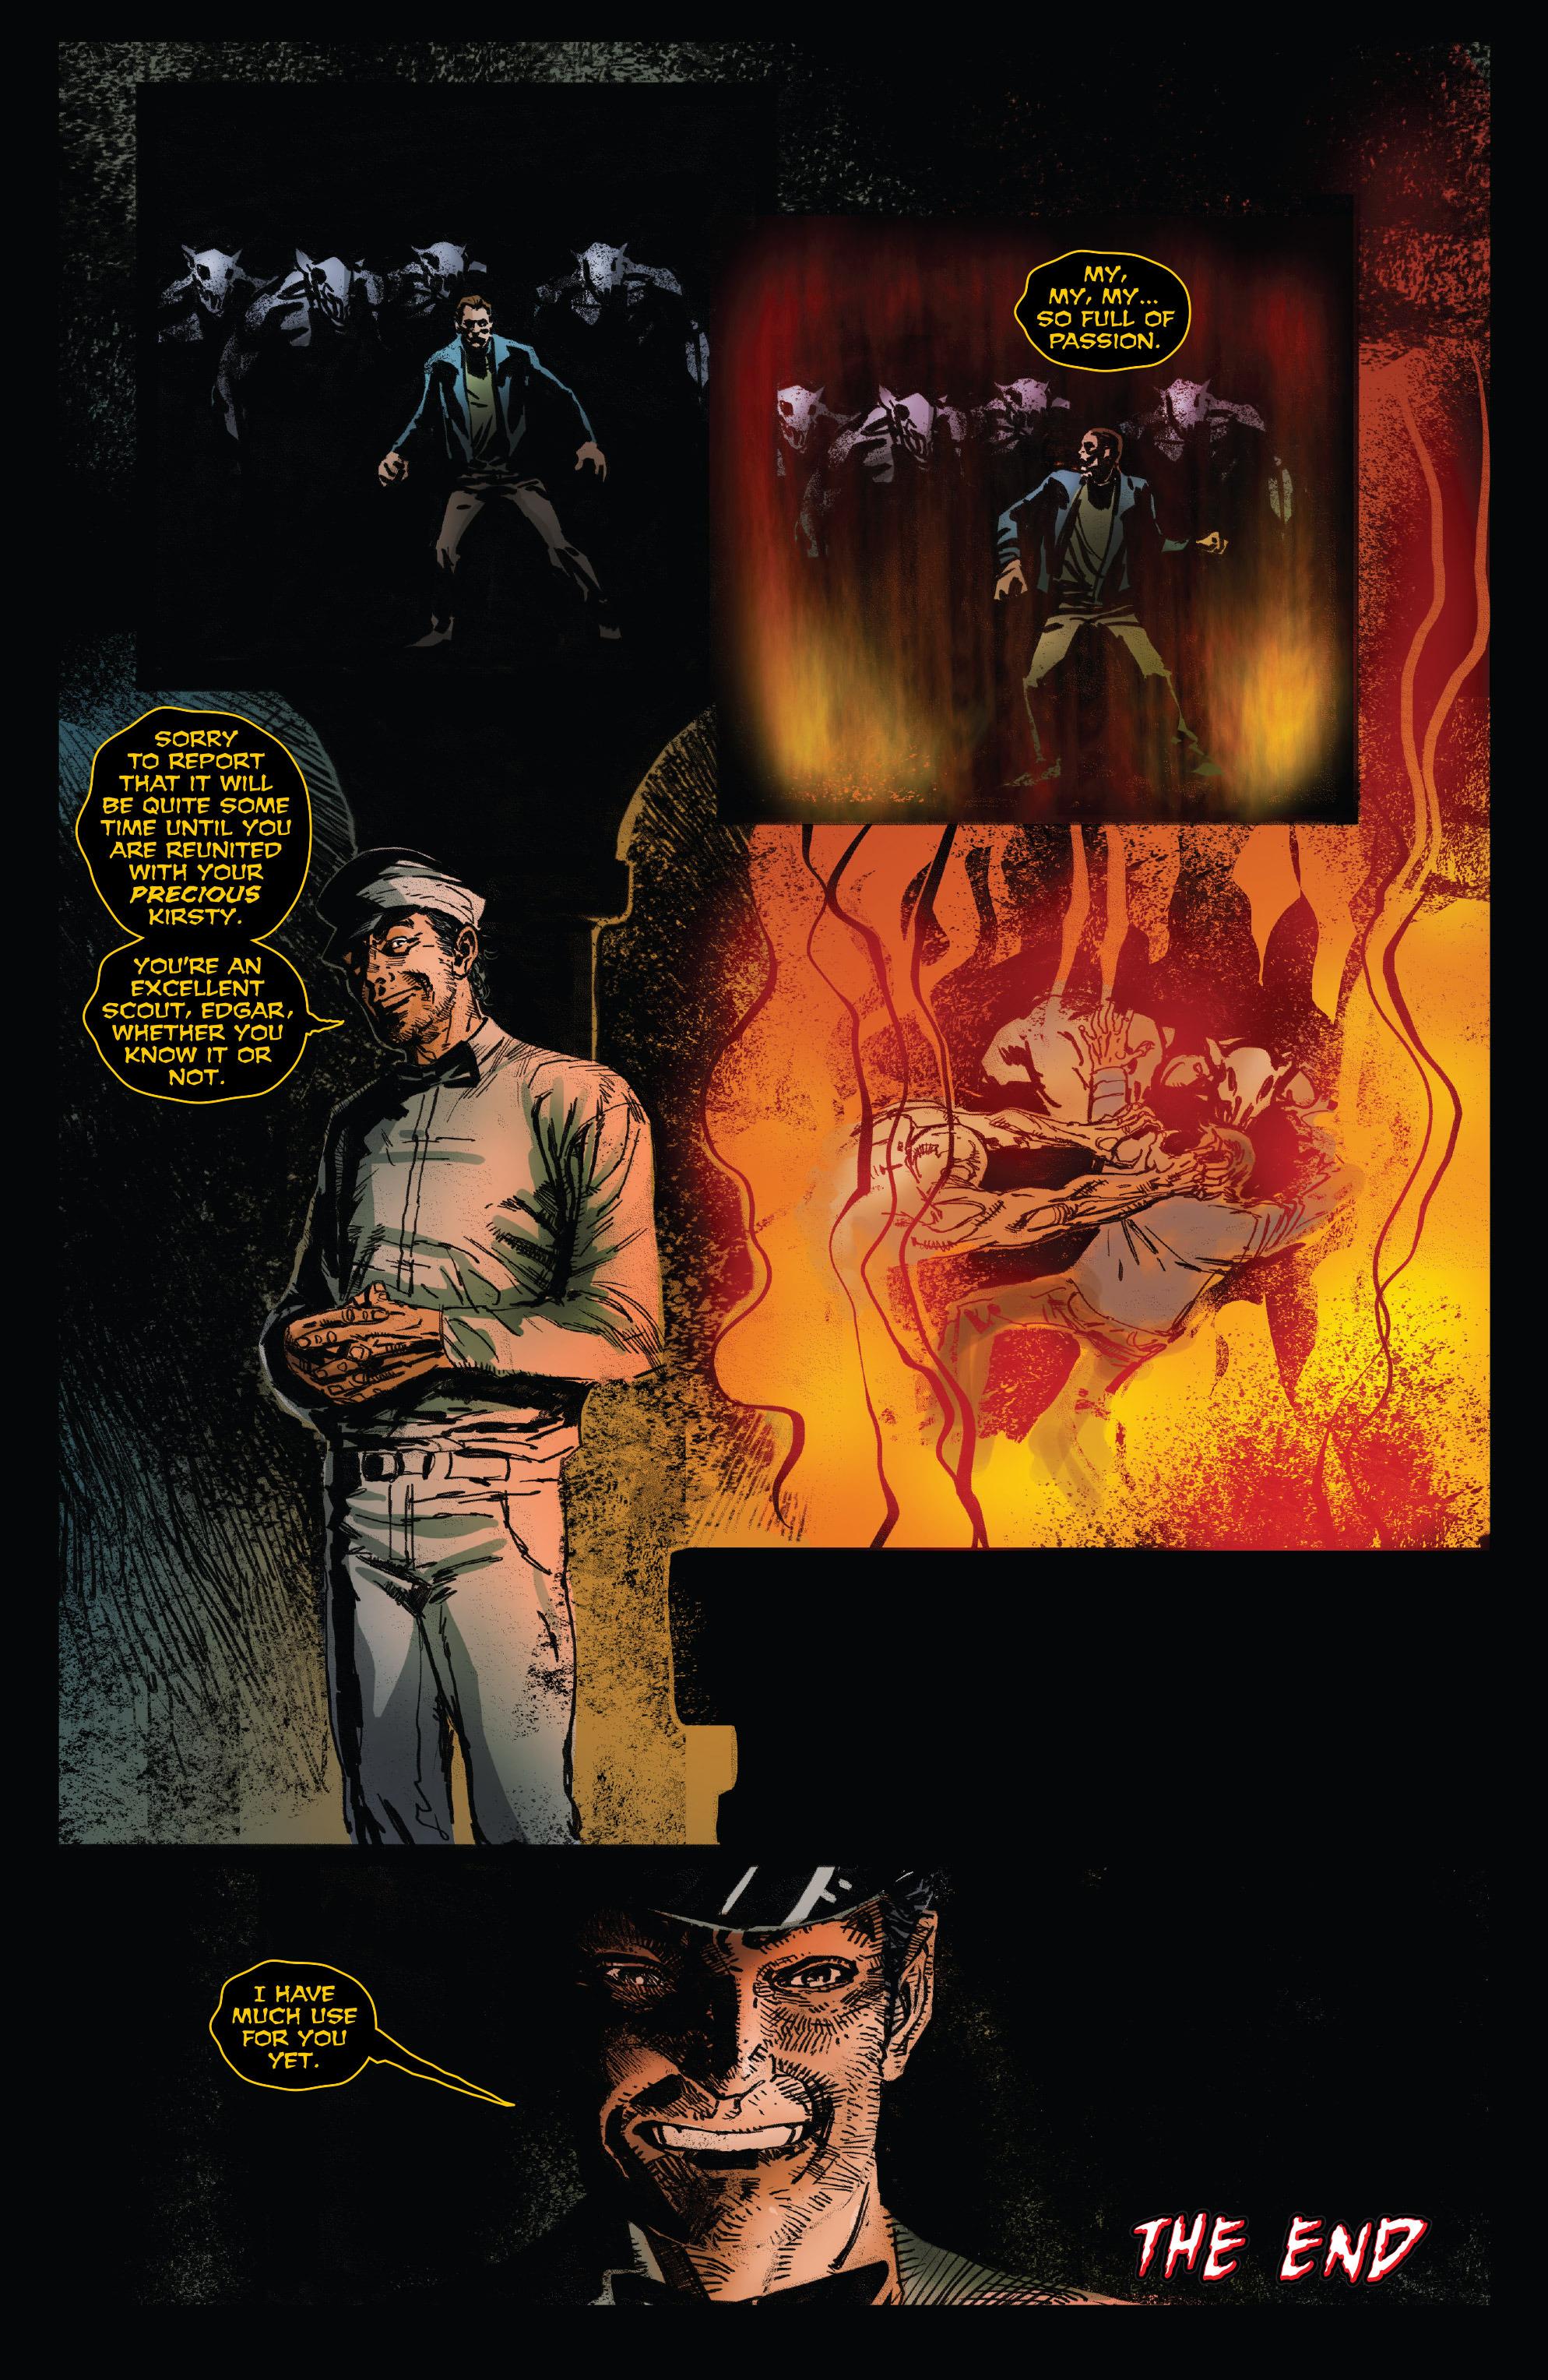 Read online Clive Barker's Hellraiser: The Dark Watch comic -  Issue # TPB 3 - 35